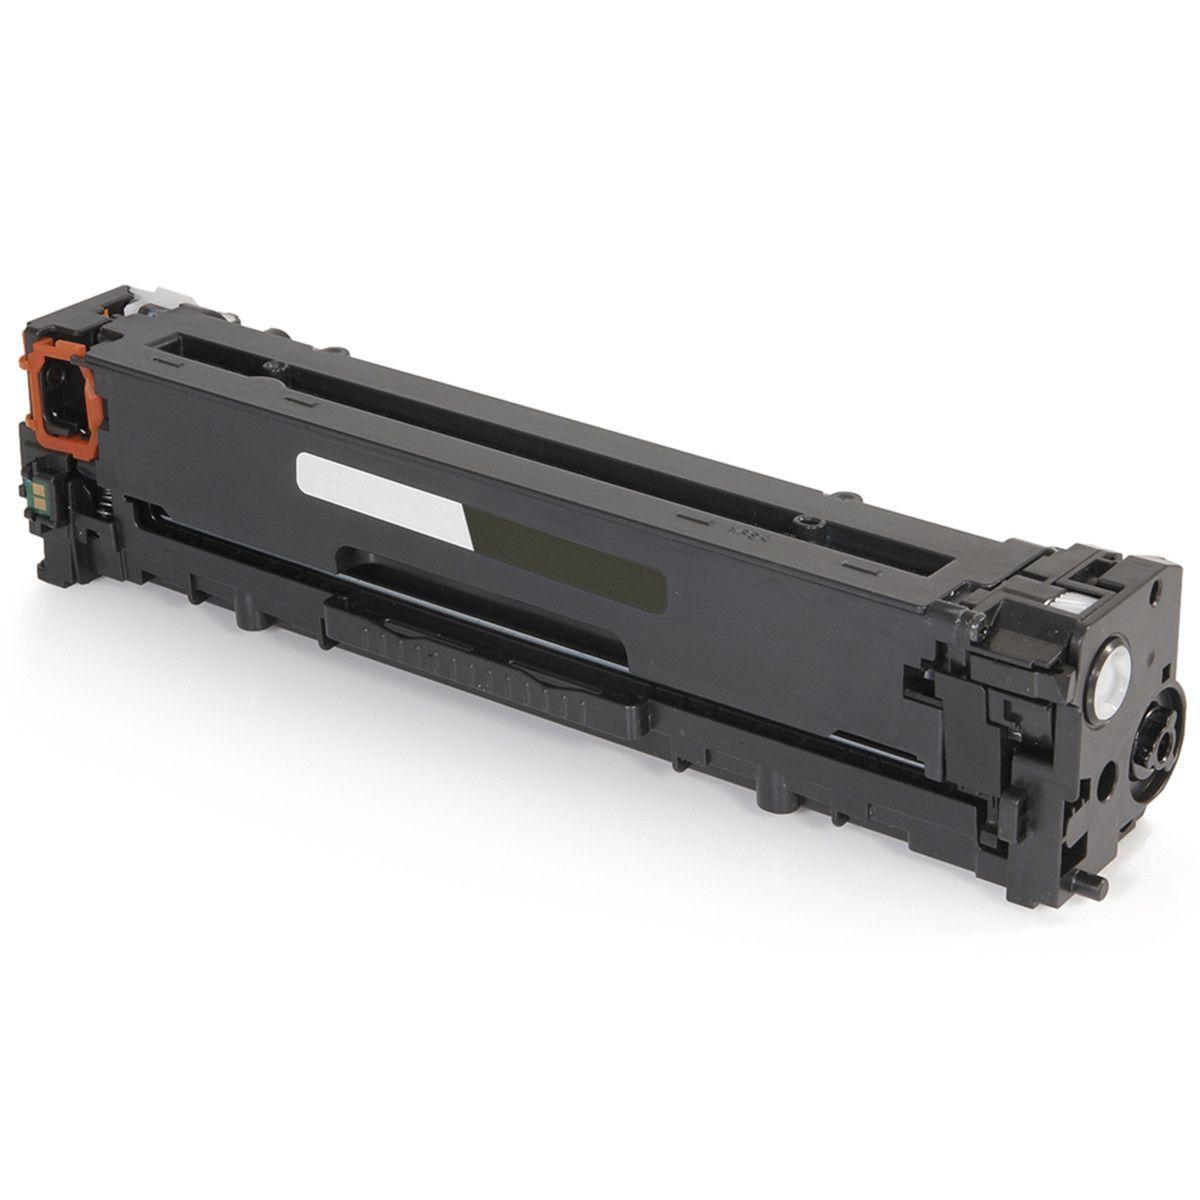 Toner Compatível CF210A CF210 210A 210 131A Preto - M251N M251NW M276N - 2,1K